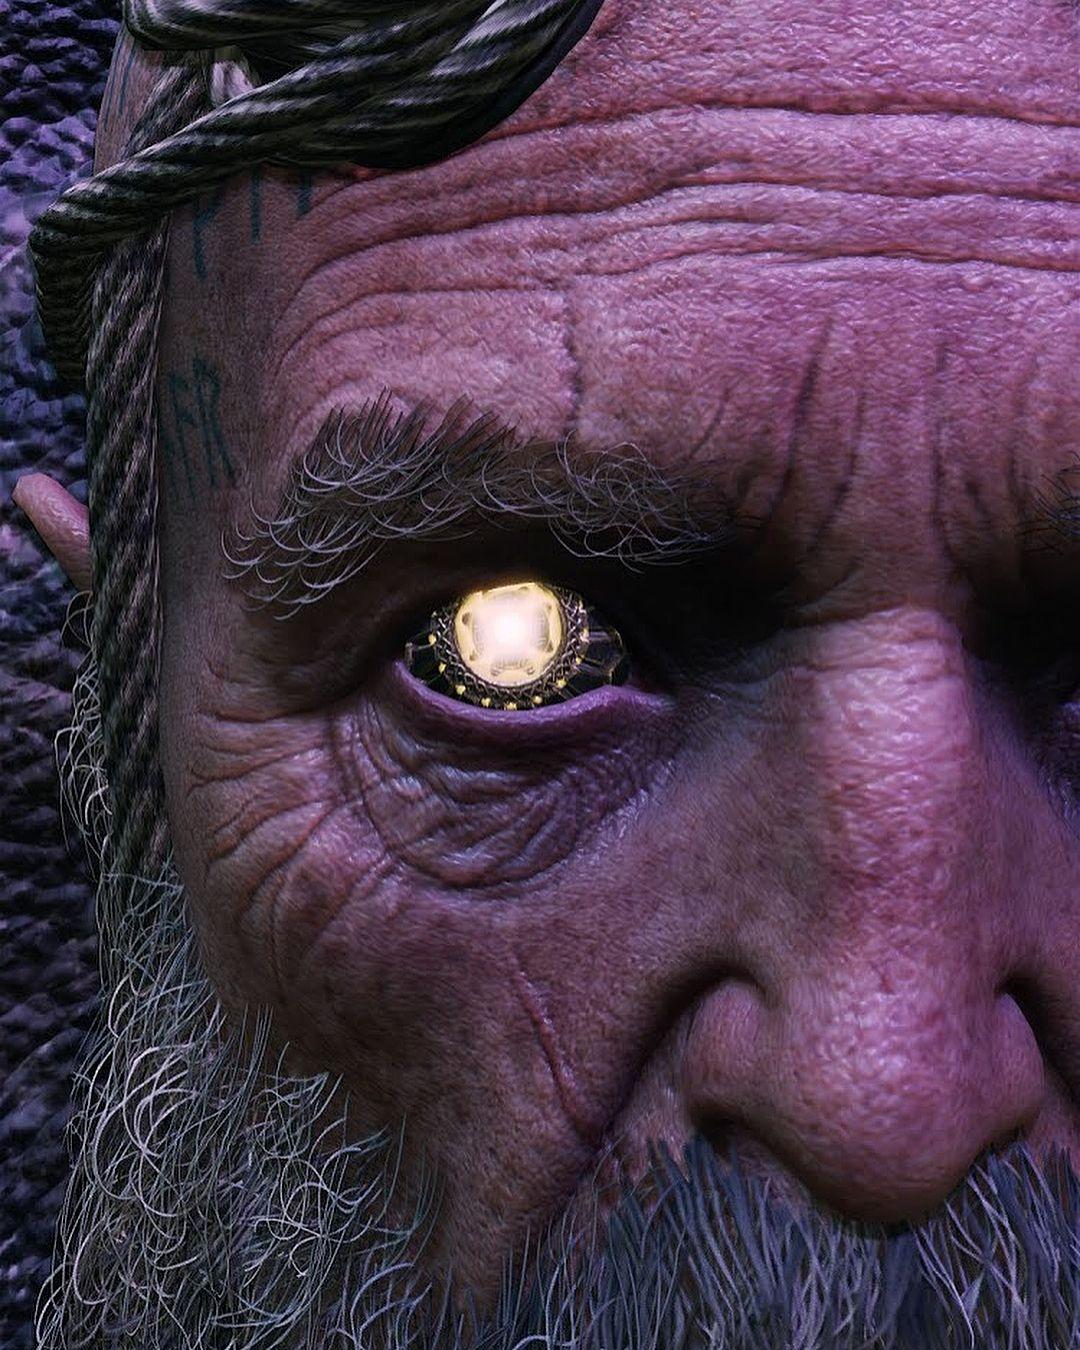 Mimir God Of War : mimir, Details, Mimir's, #mimir, #PS4share, #PSBlog, #GoW4, #GodofWar, #GodofWar4, #Atreus, #Kratos, #Norse, #NorseMythology, #G…, Kratos